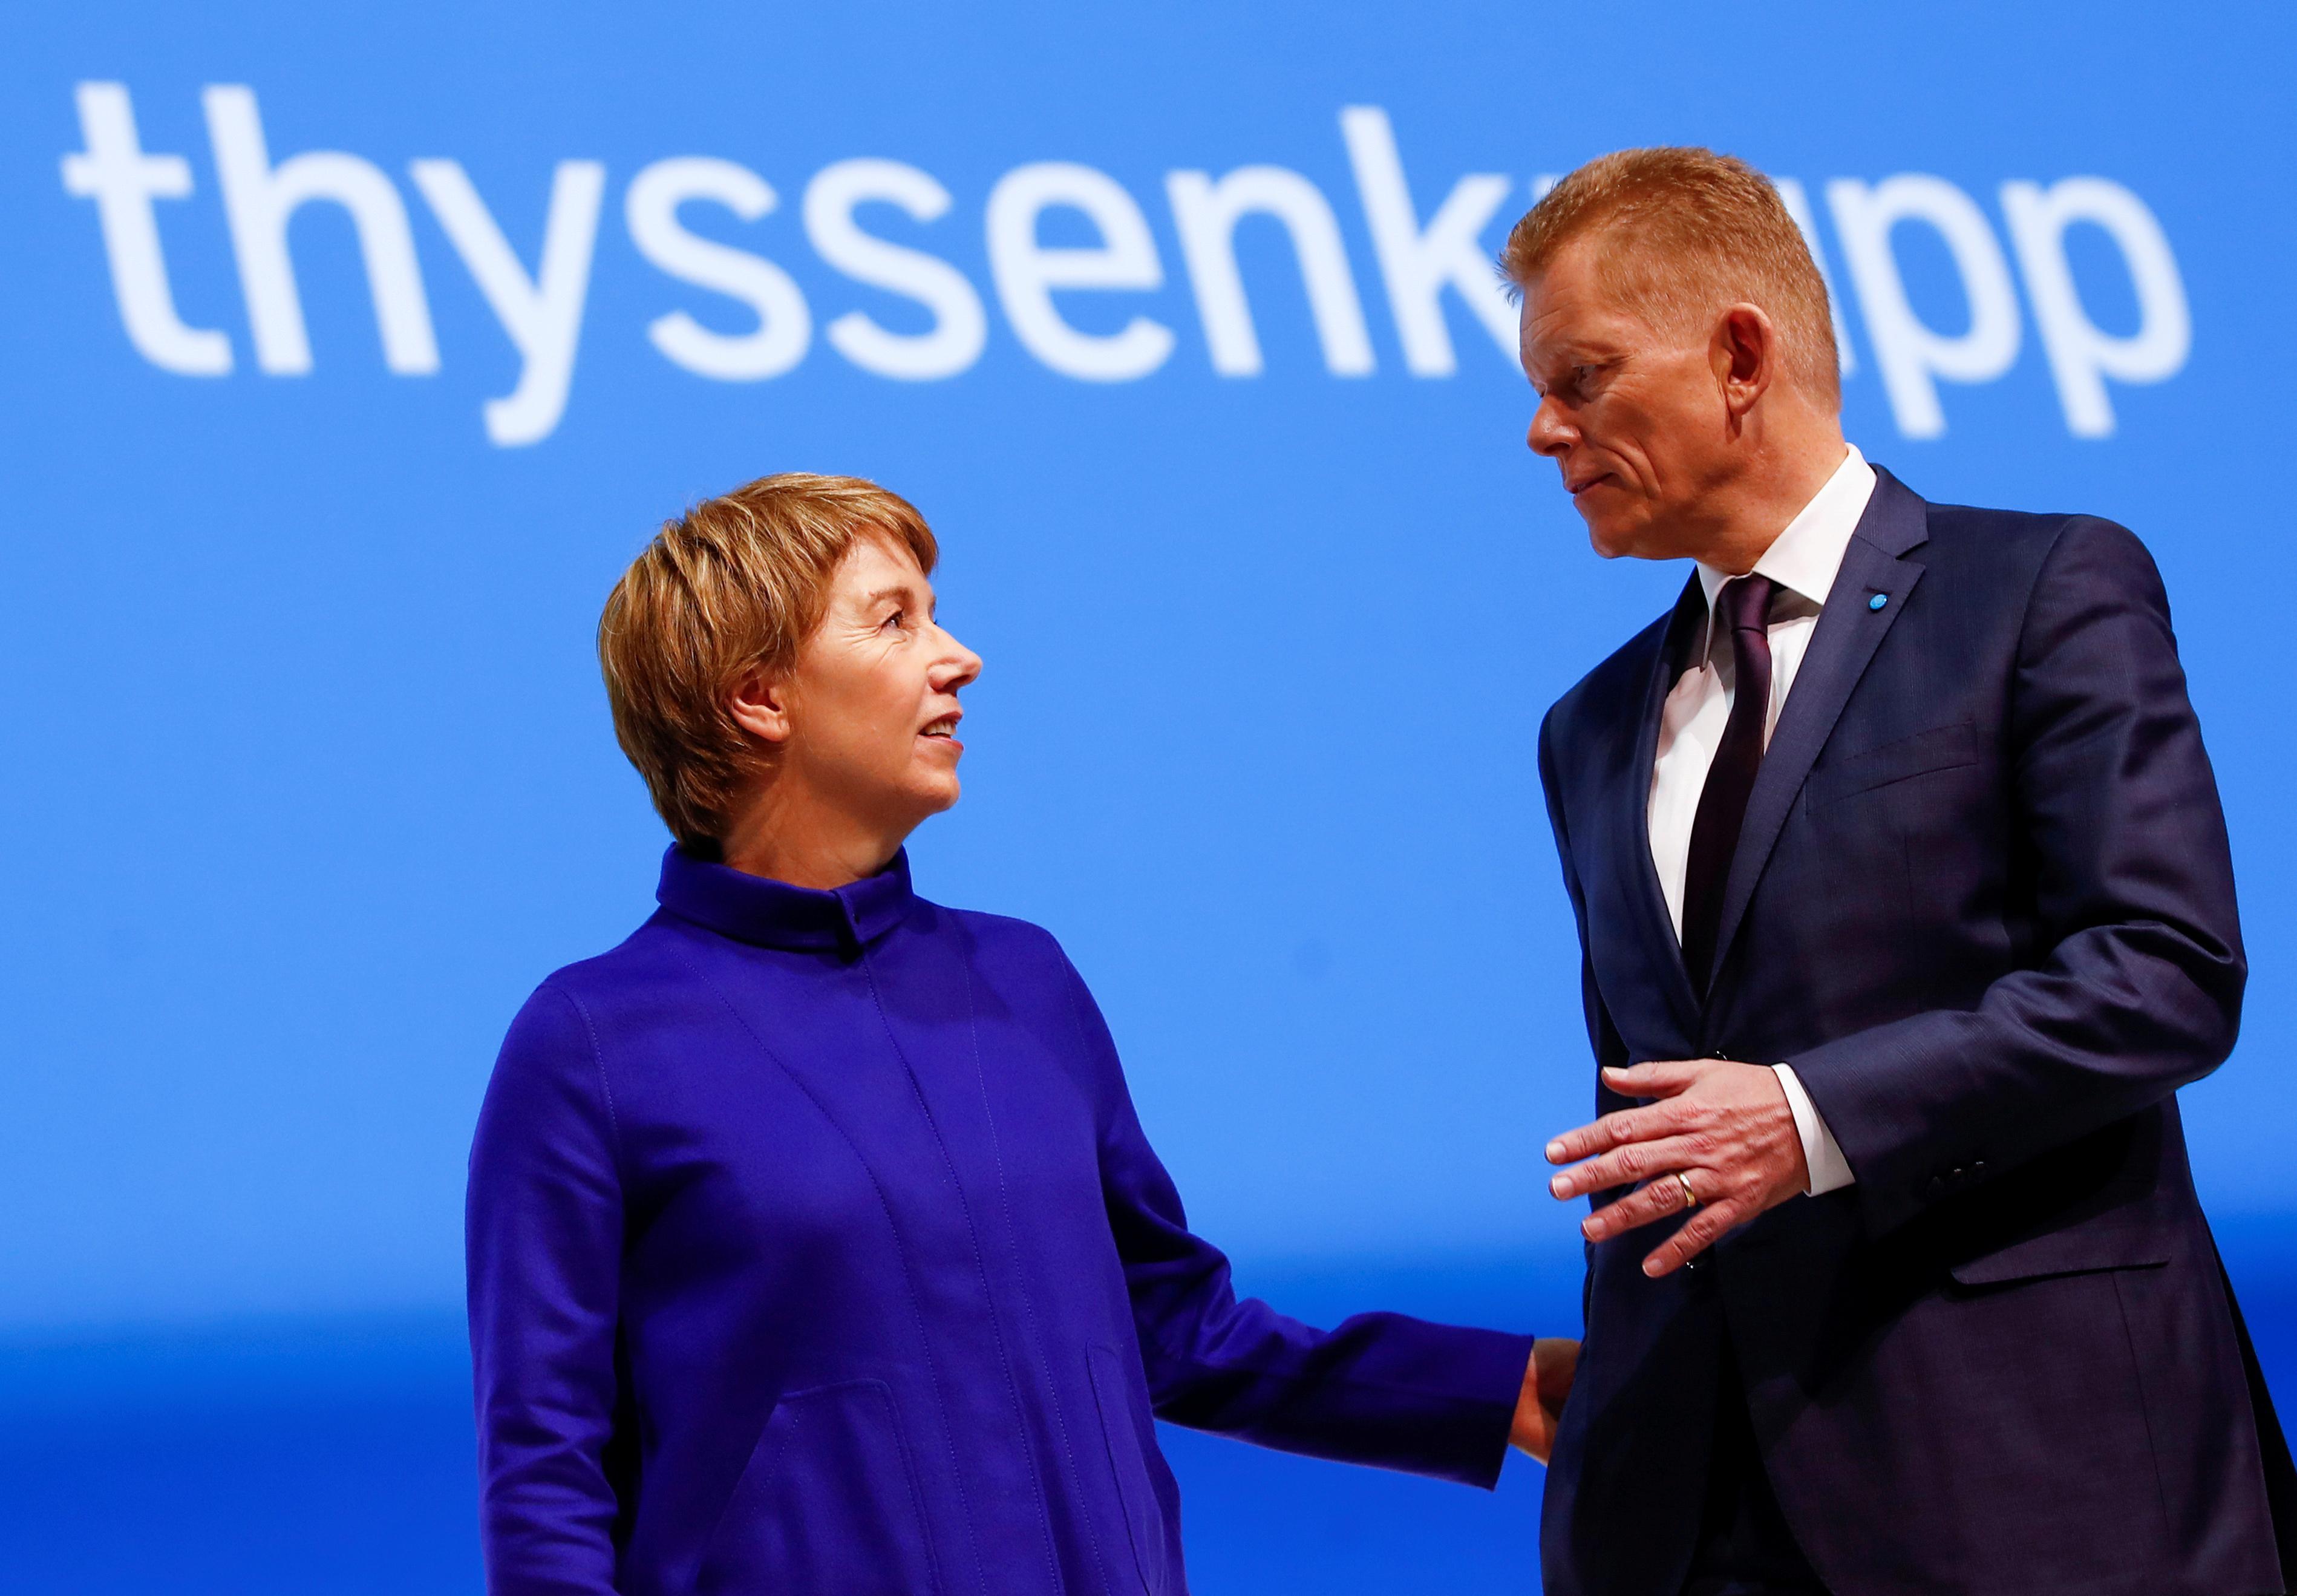 Thyssenkrupp News Today